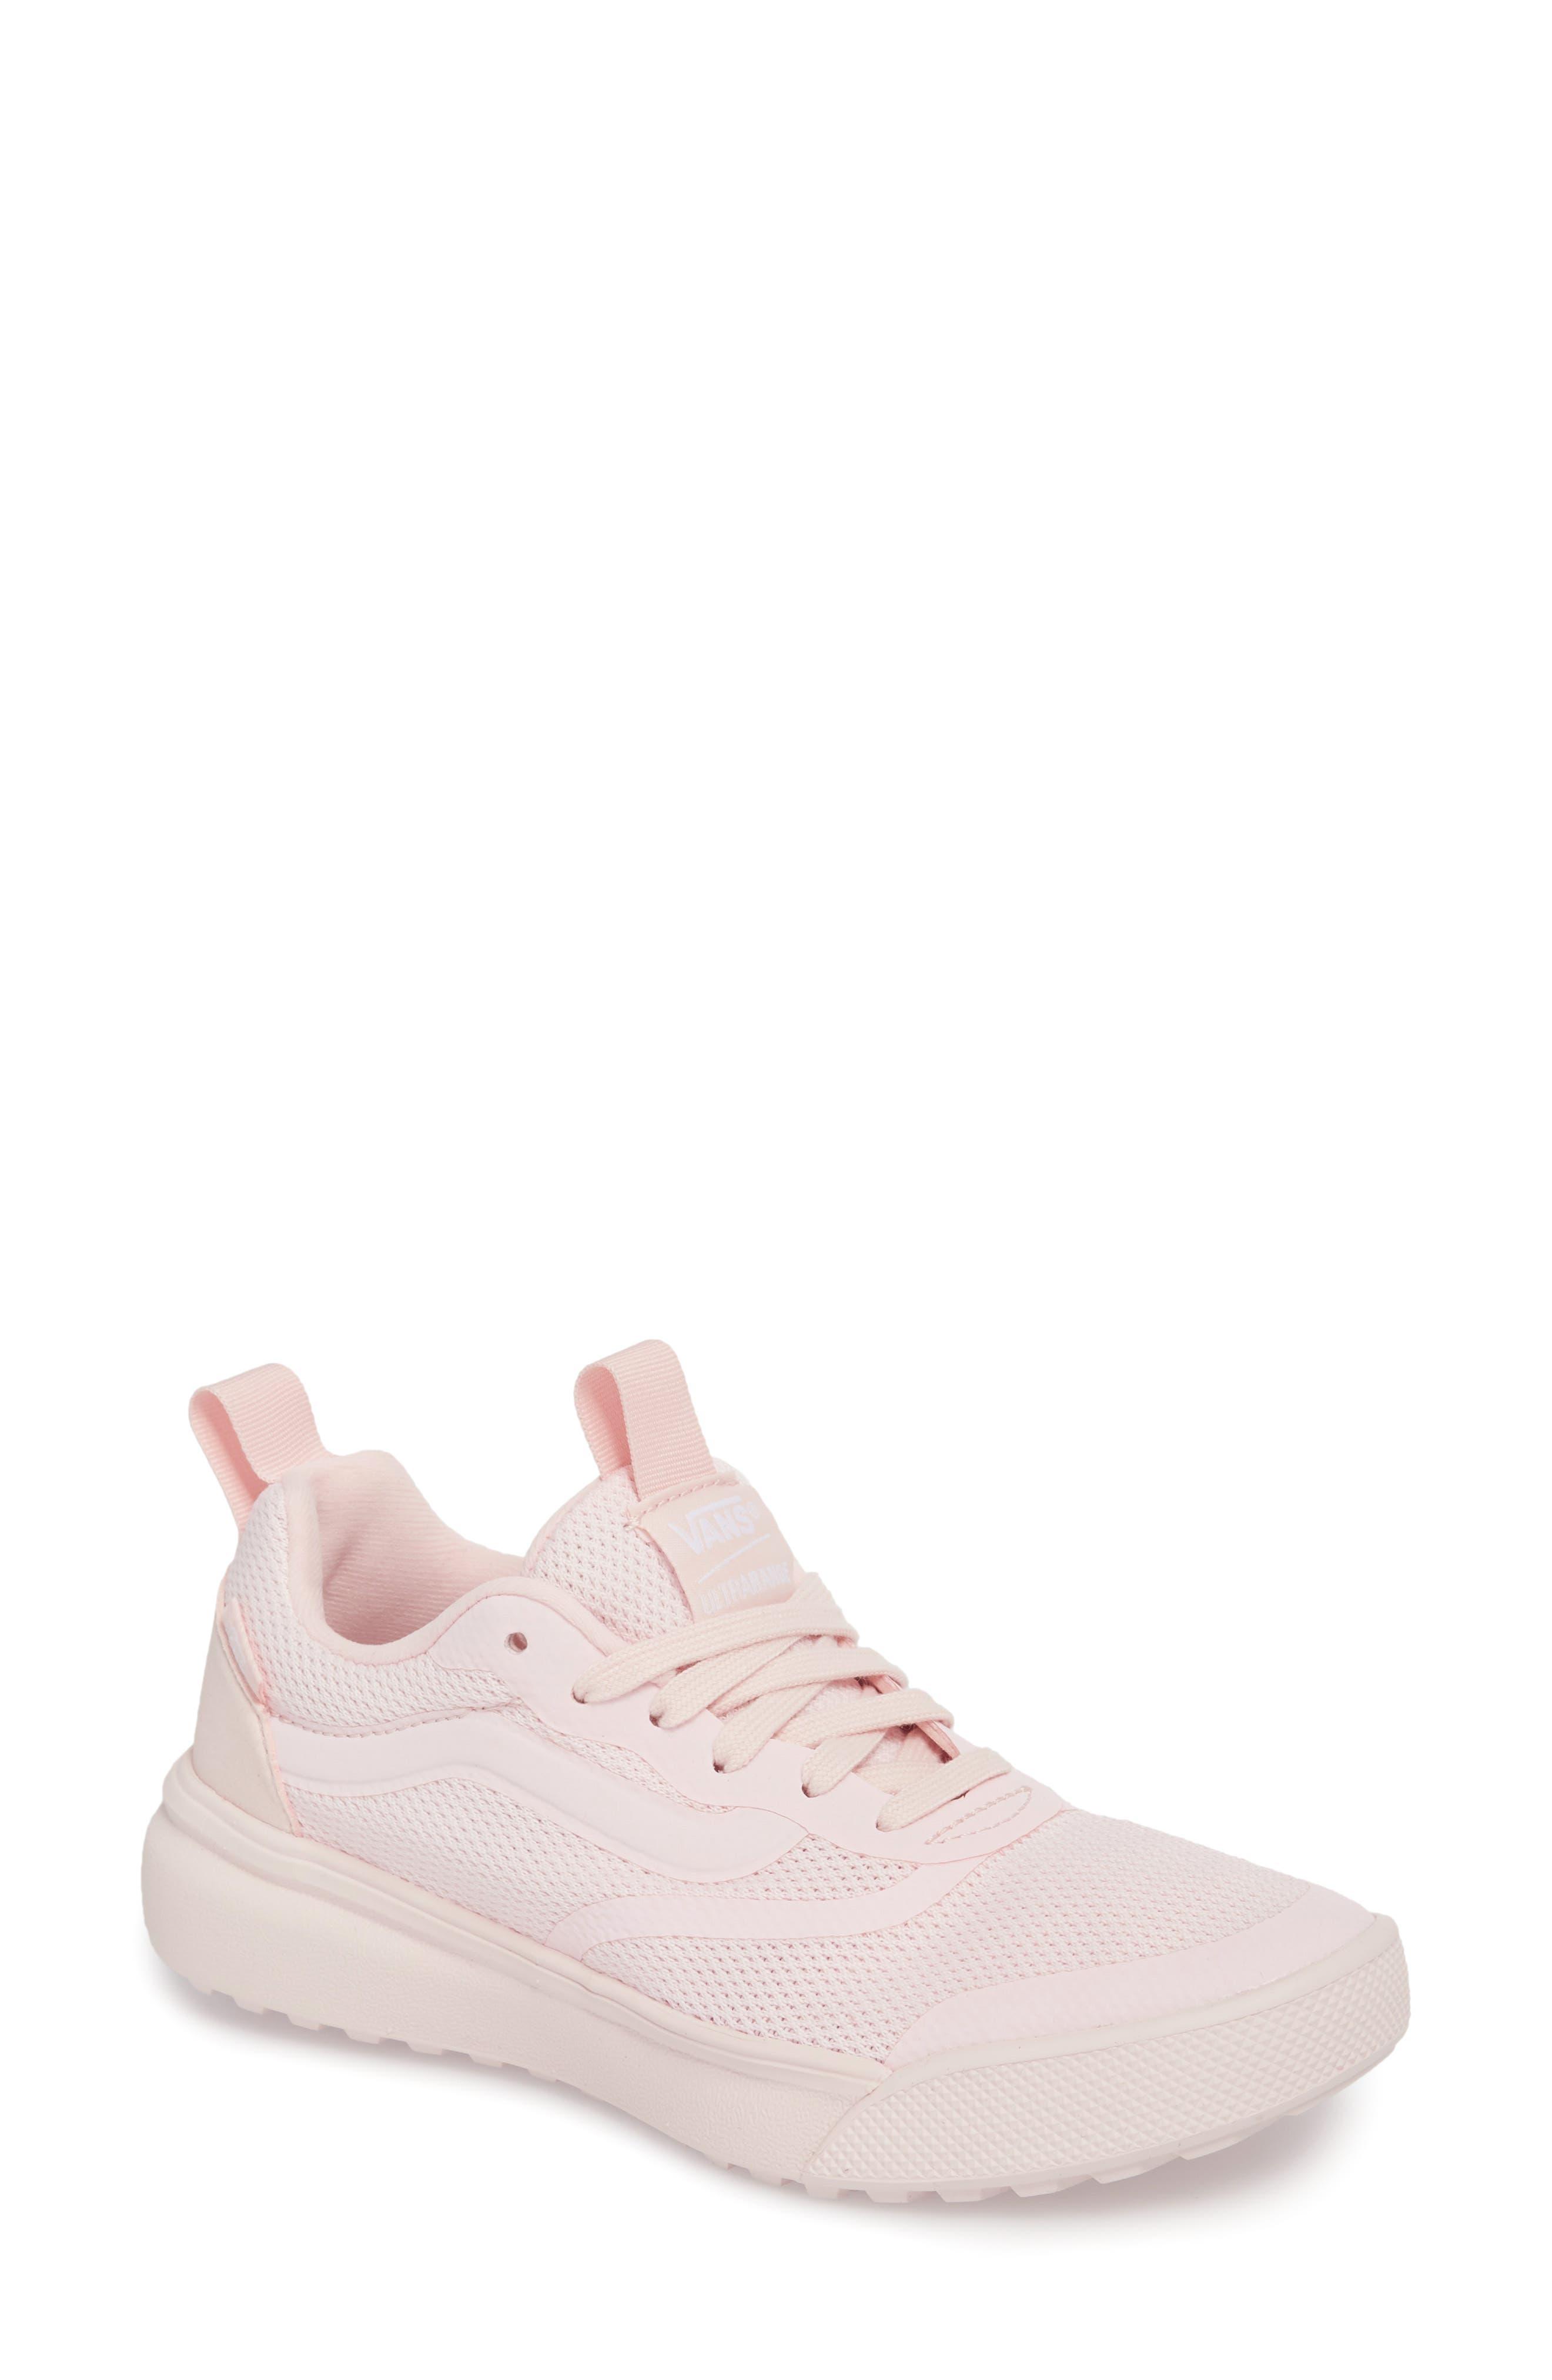 Vans UltraRange Rapidweld Sneaker (Women)